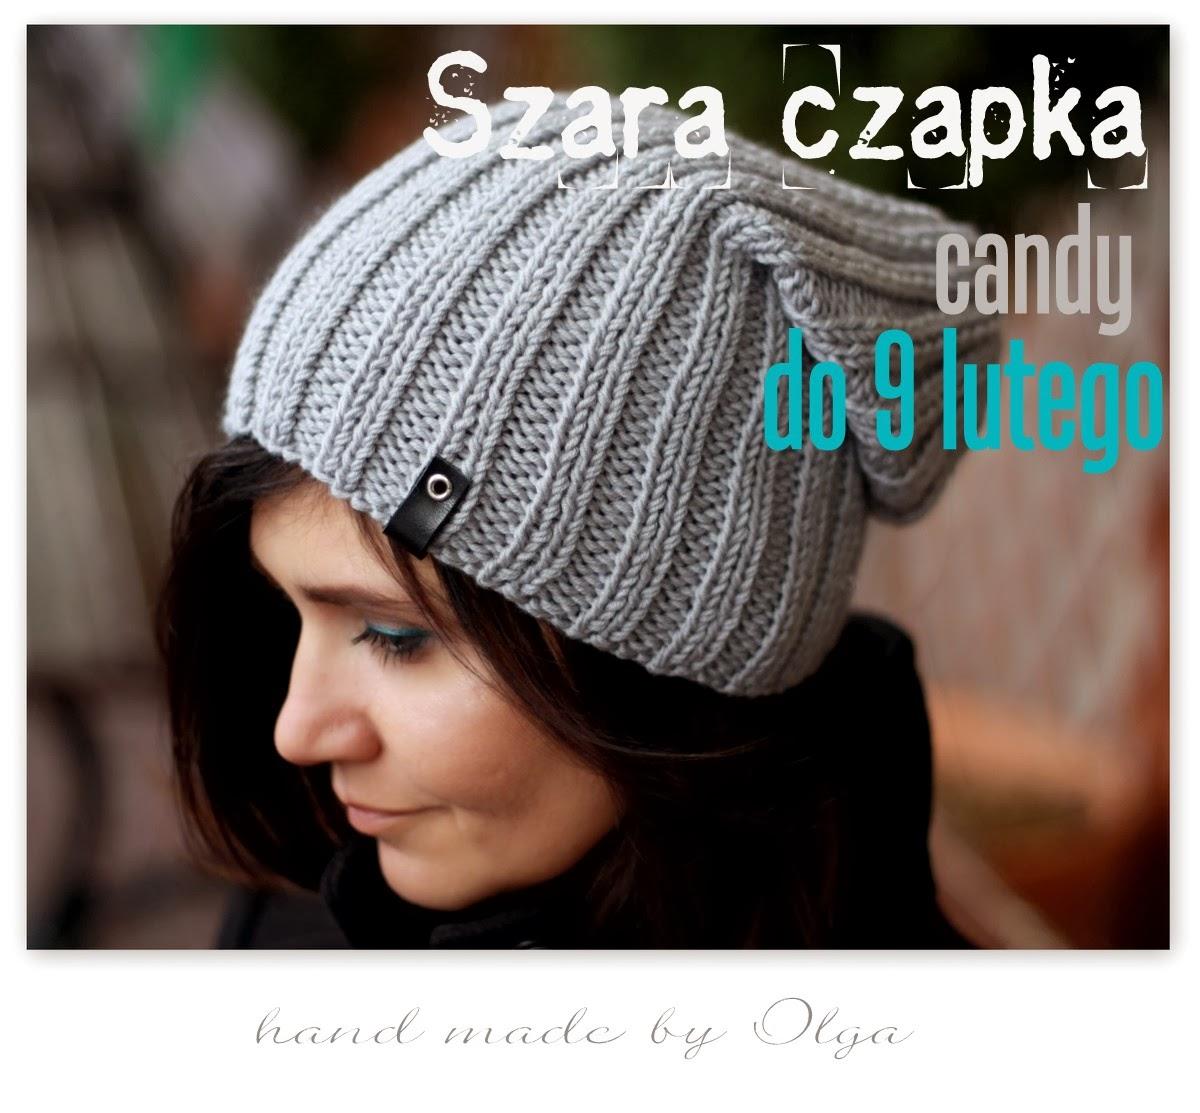 http://handmadebyolga.blogspot.com/2014/01/szara-czapka-rocznicowe-candy.html